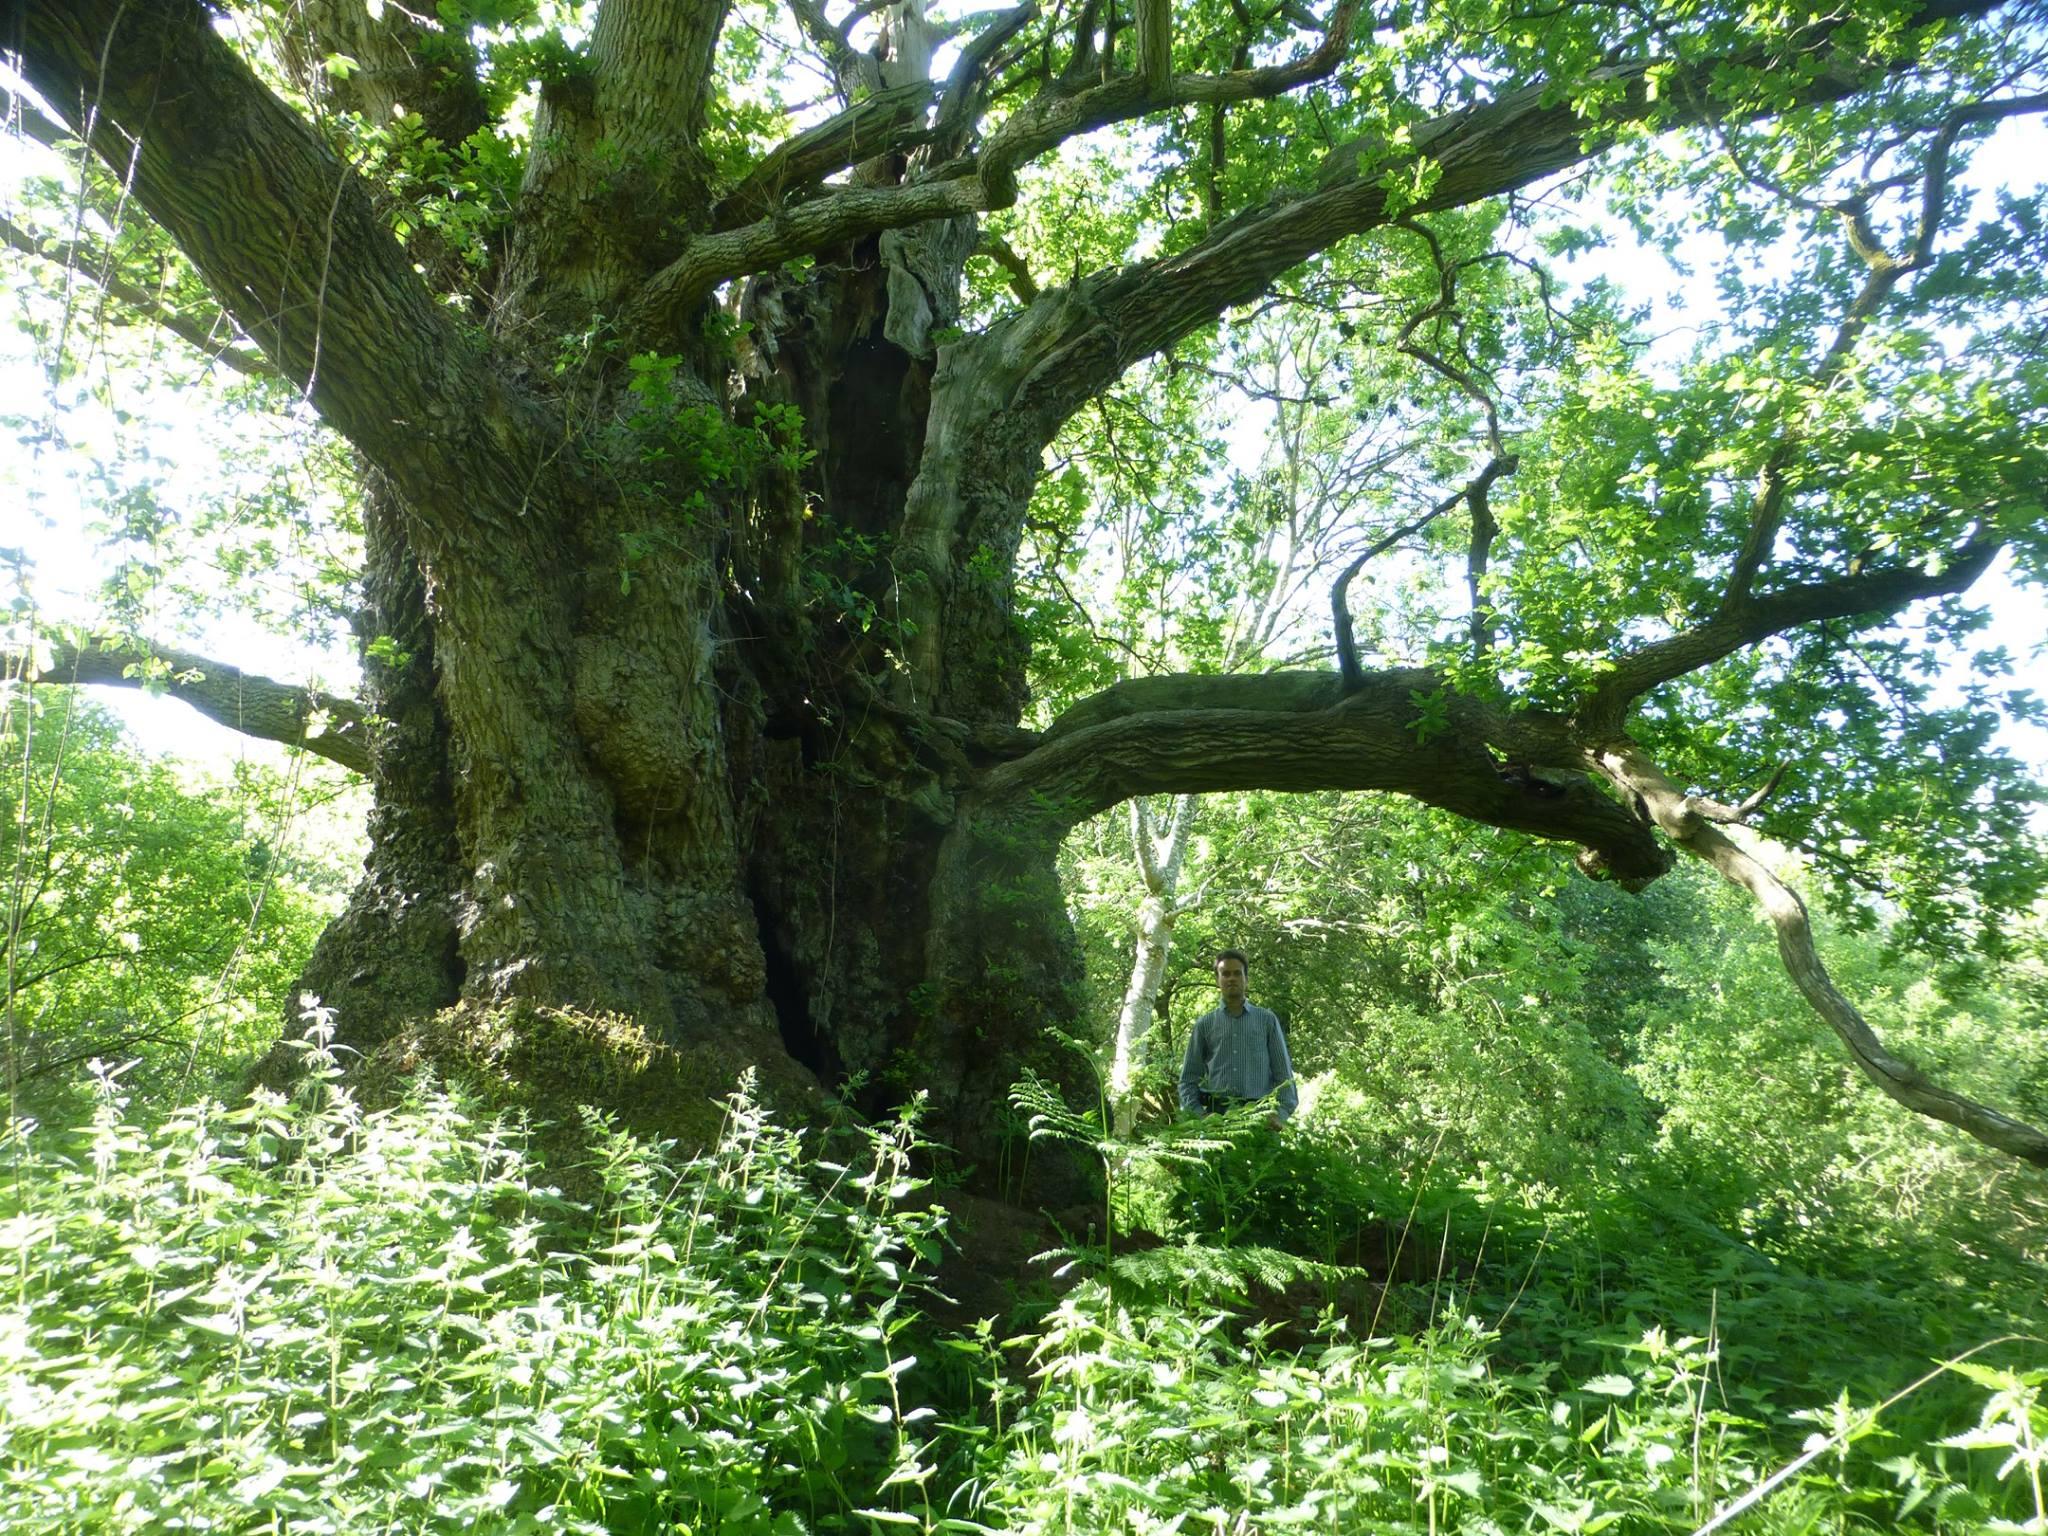 Oxfordshire oak